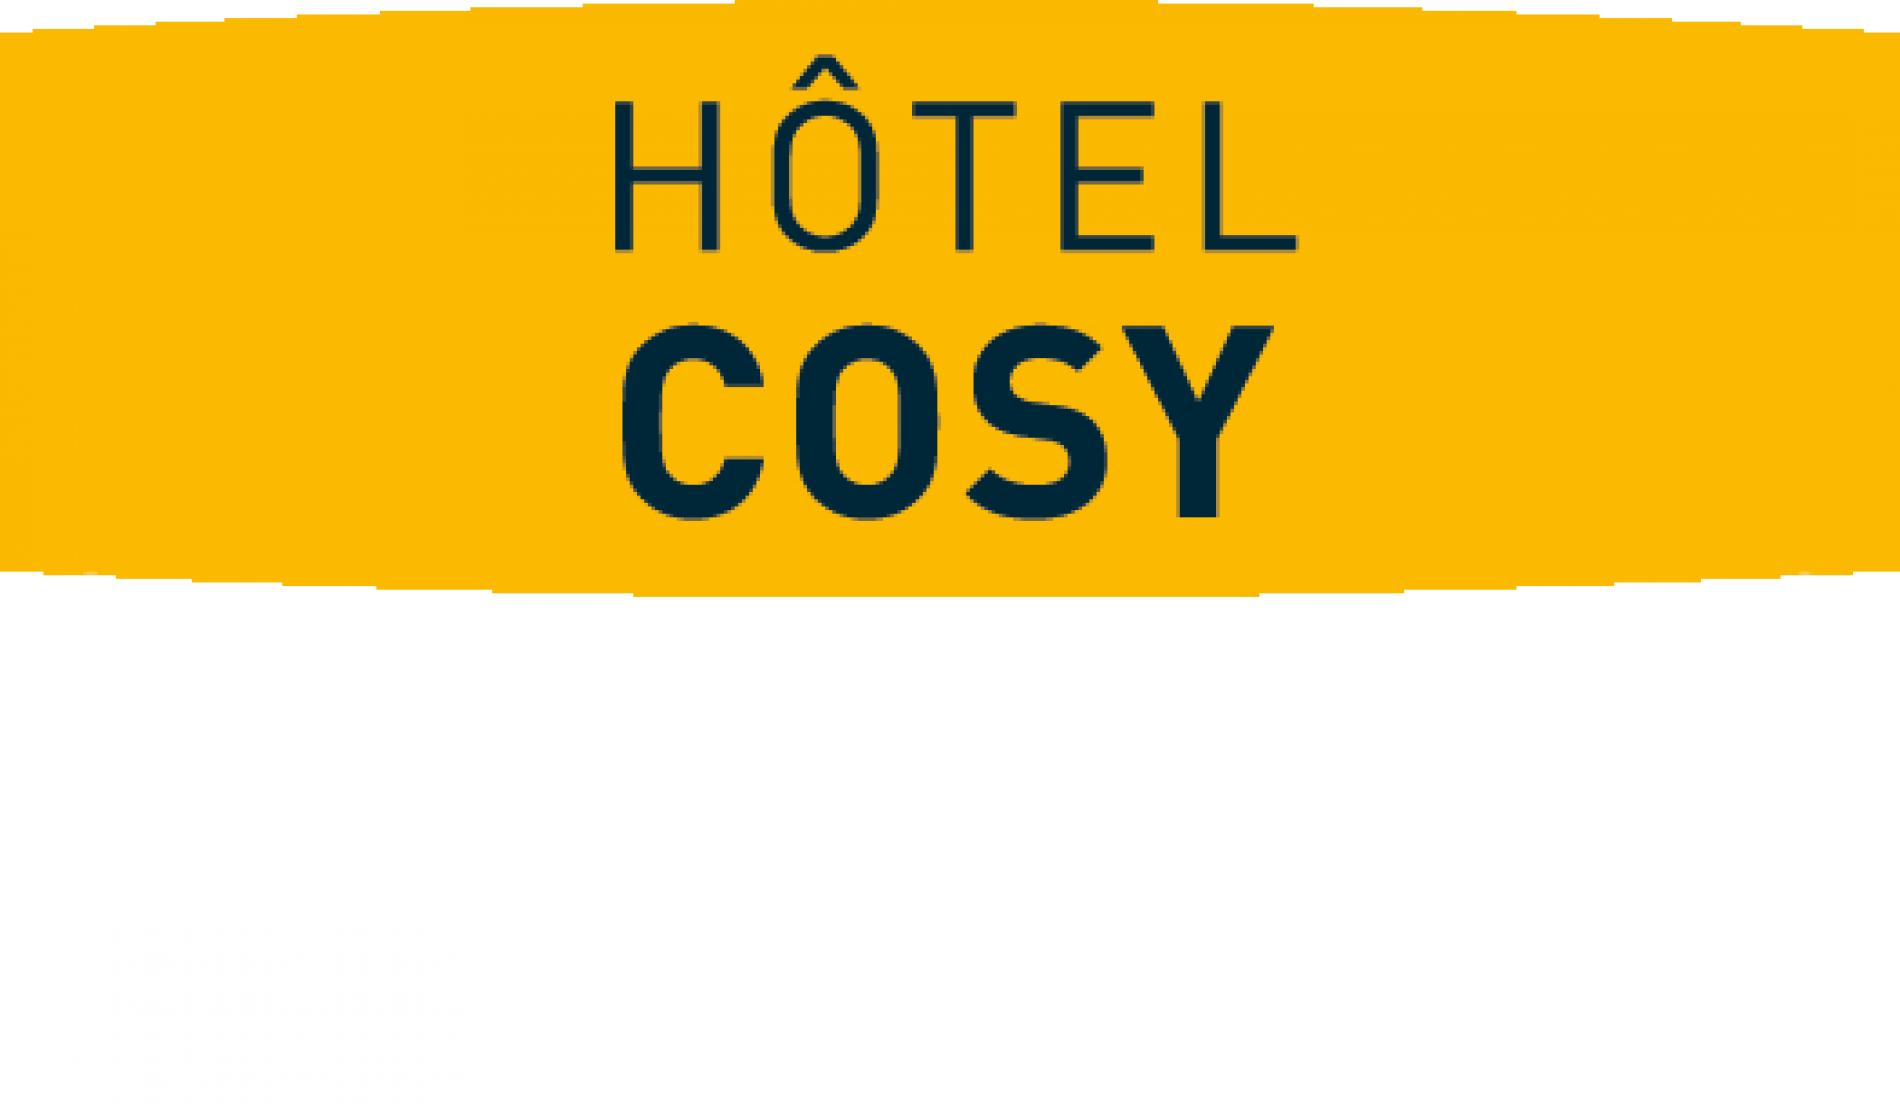 Logo logis hôtel cosy